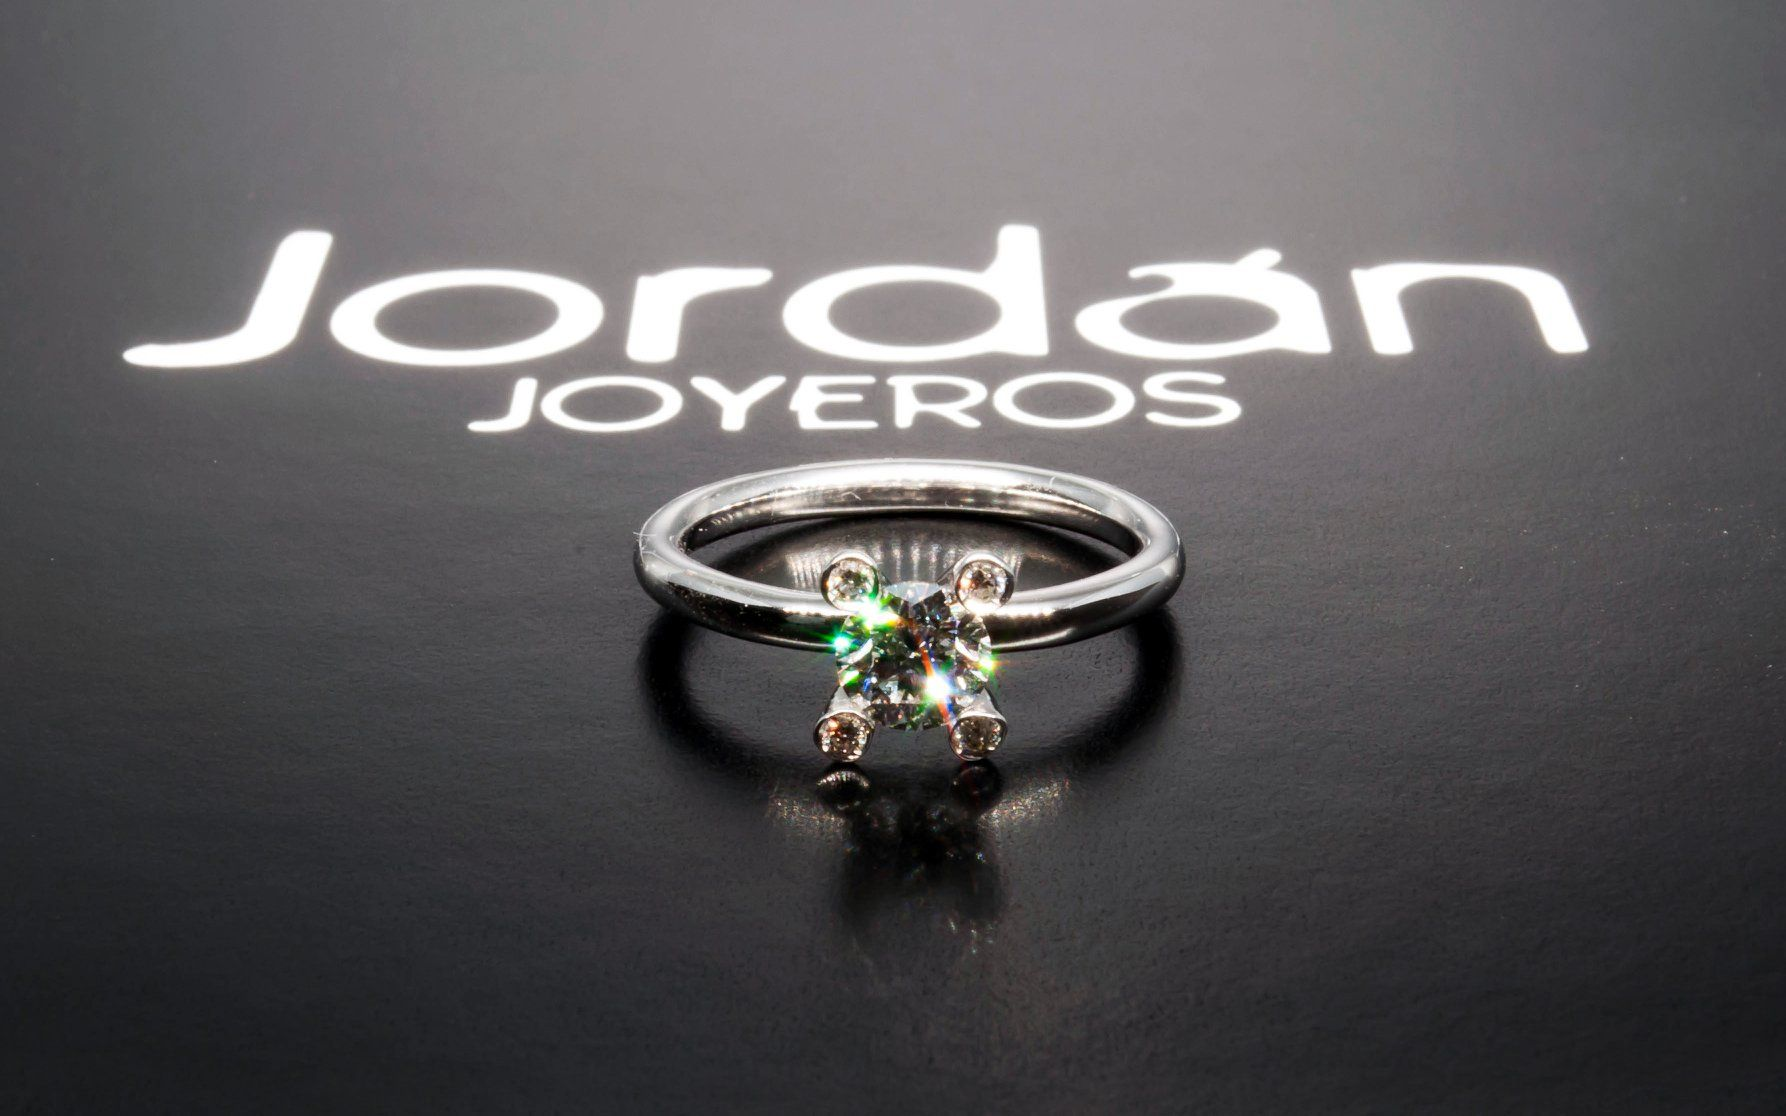 78f42fa59333  JordanJoyeros  Fabricantes  diseño  design  sortija  ring  oroblanco   whitegold  solitario  diamante  diamond  brillante  brilliant  amoreterno  ...